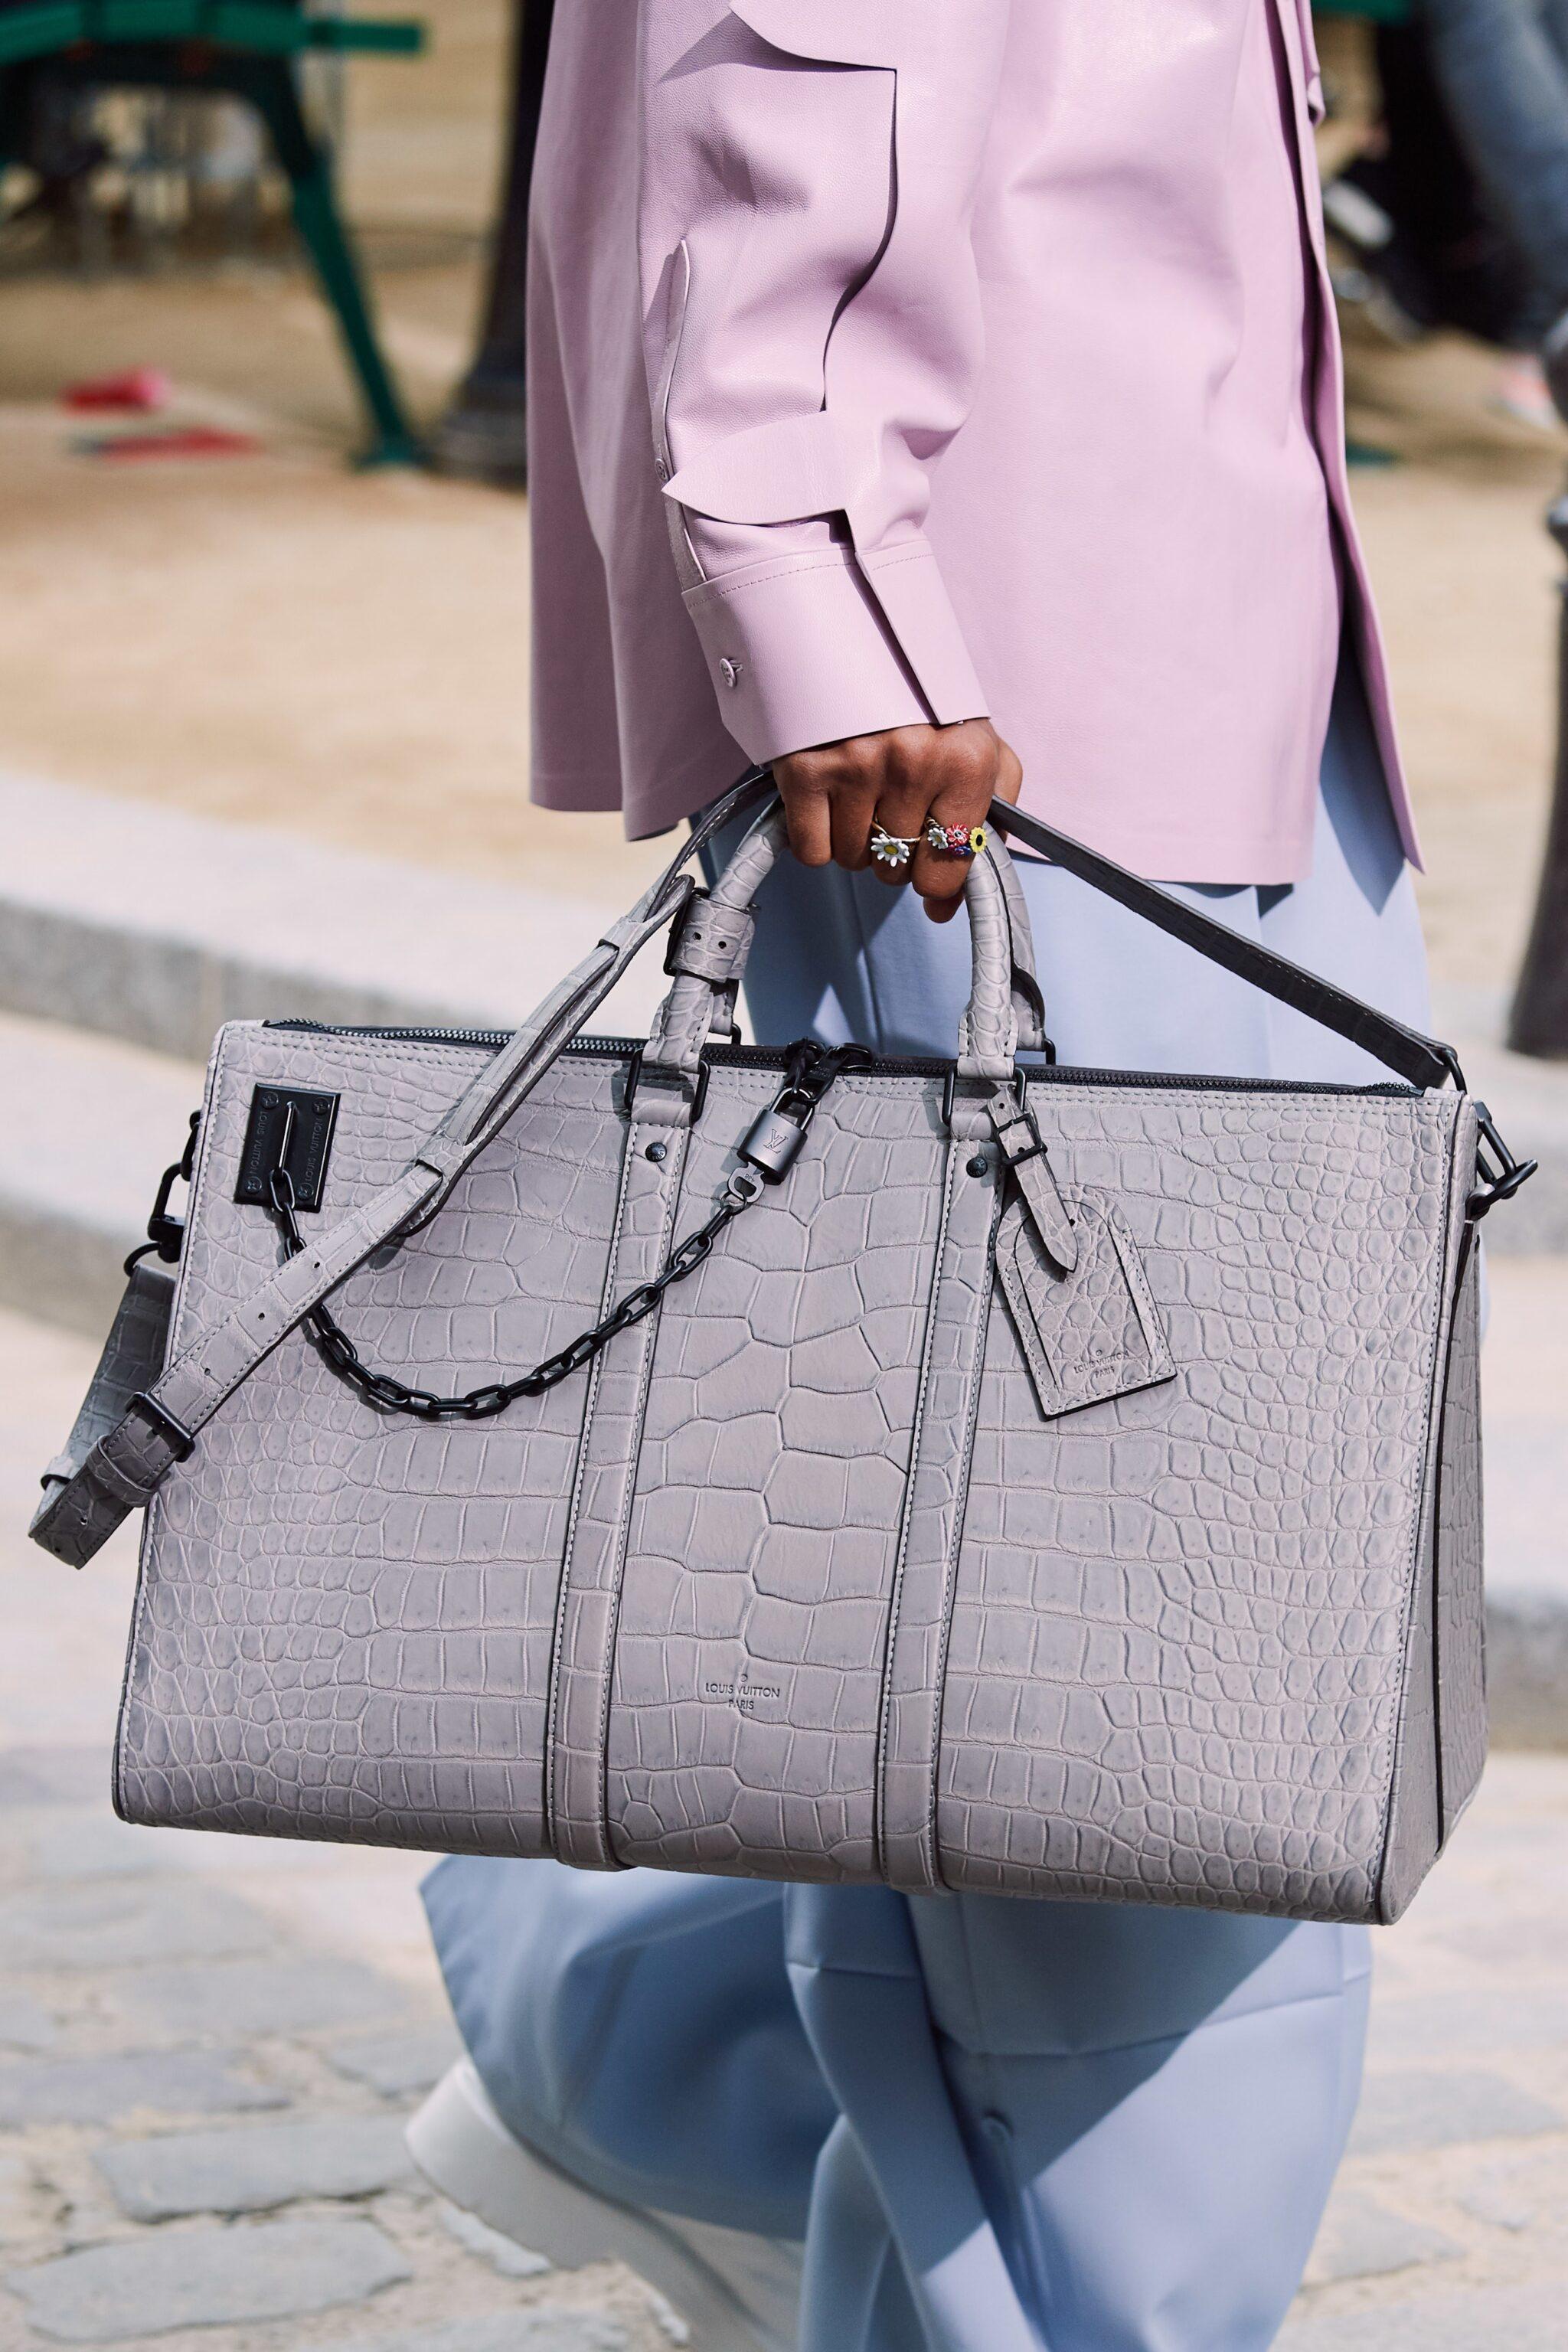 Louis Vuitton Men's Spring/Summer 2020 Runway Bag